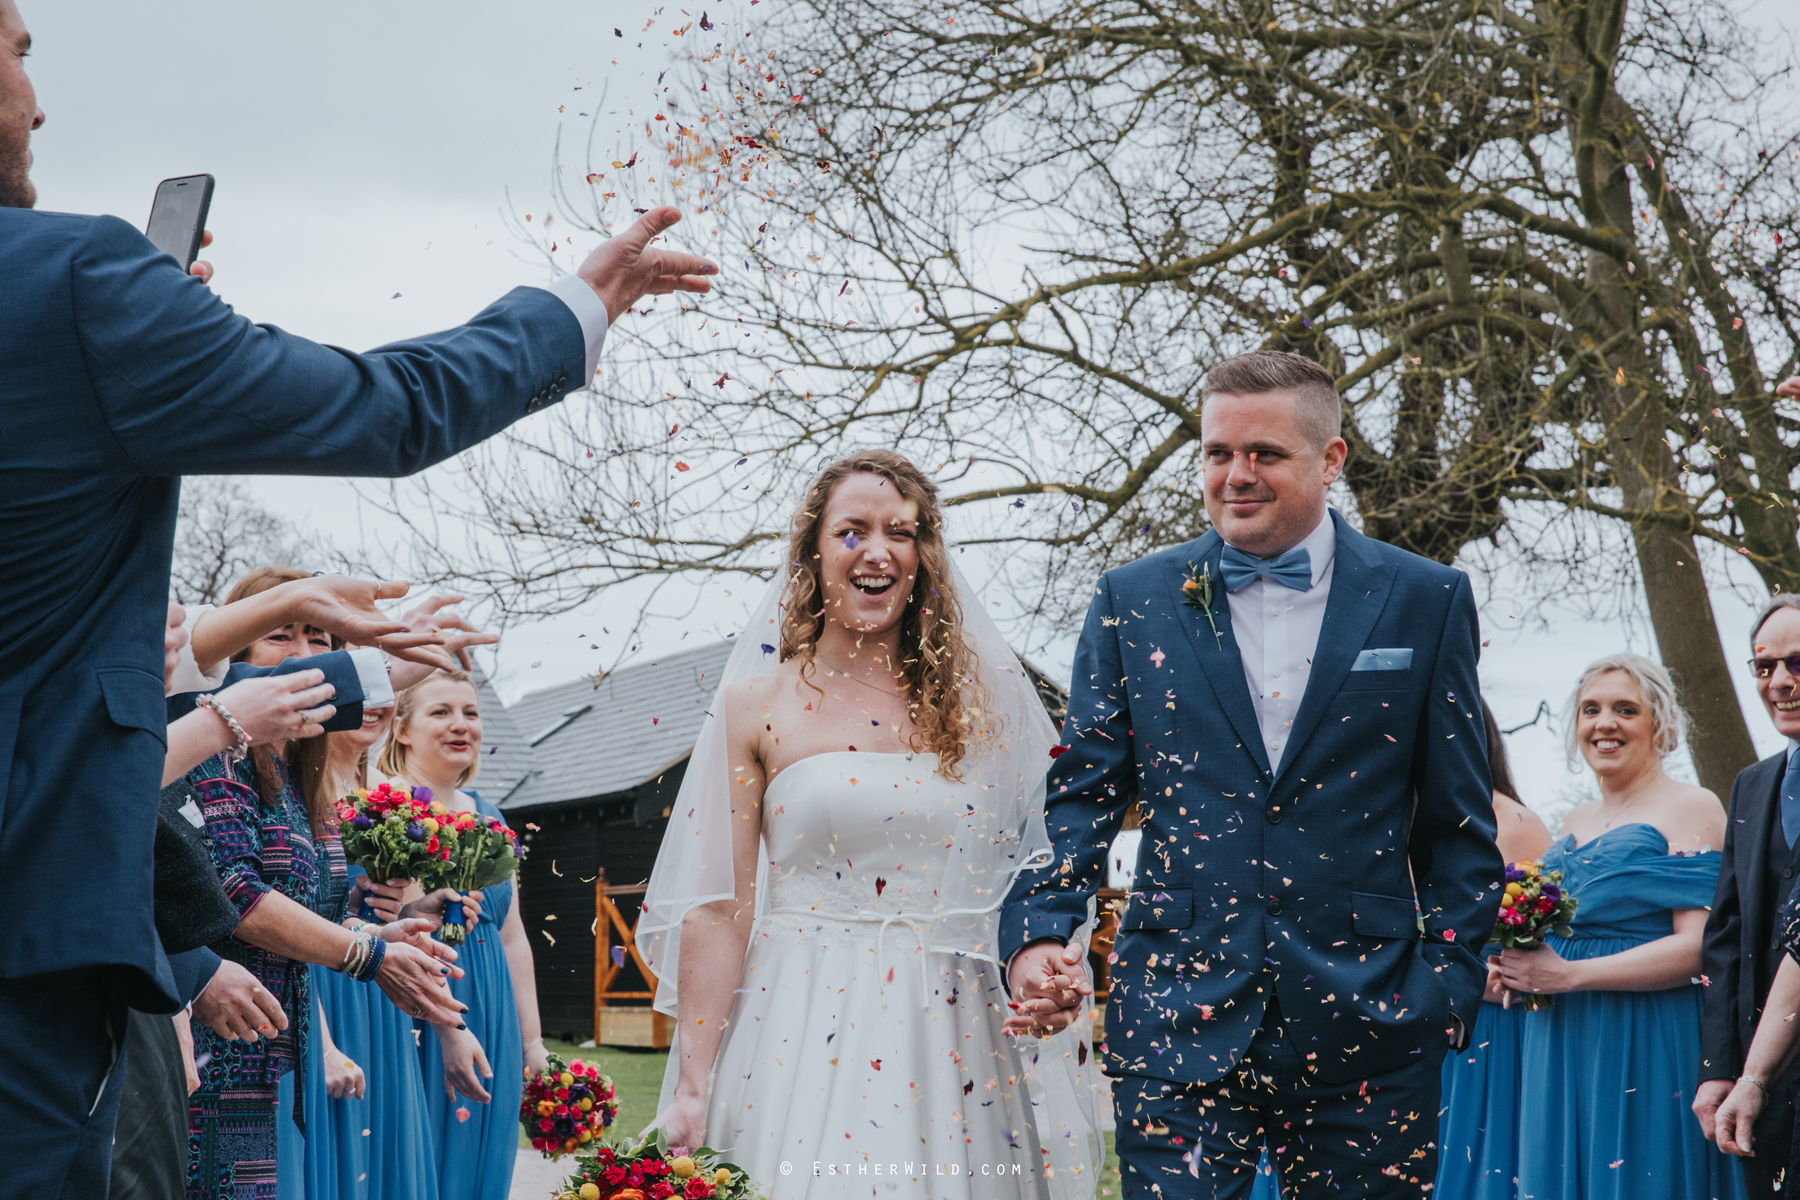 The_BoatHouse_Wedding_Venue_Ormesby_Norfolk_Broads_Boat_Wedding_Photography_Esther_Wild_Photographer_IMG_1403.jpg